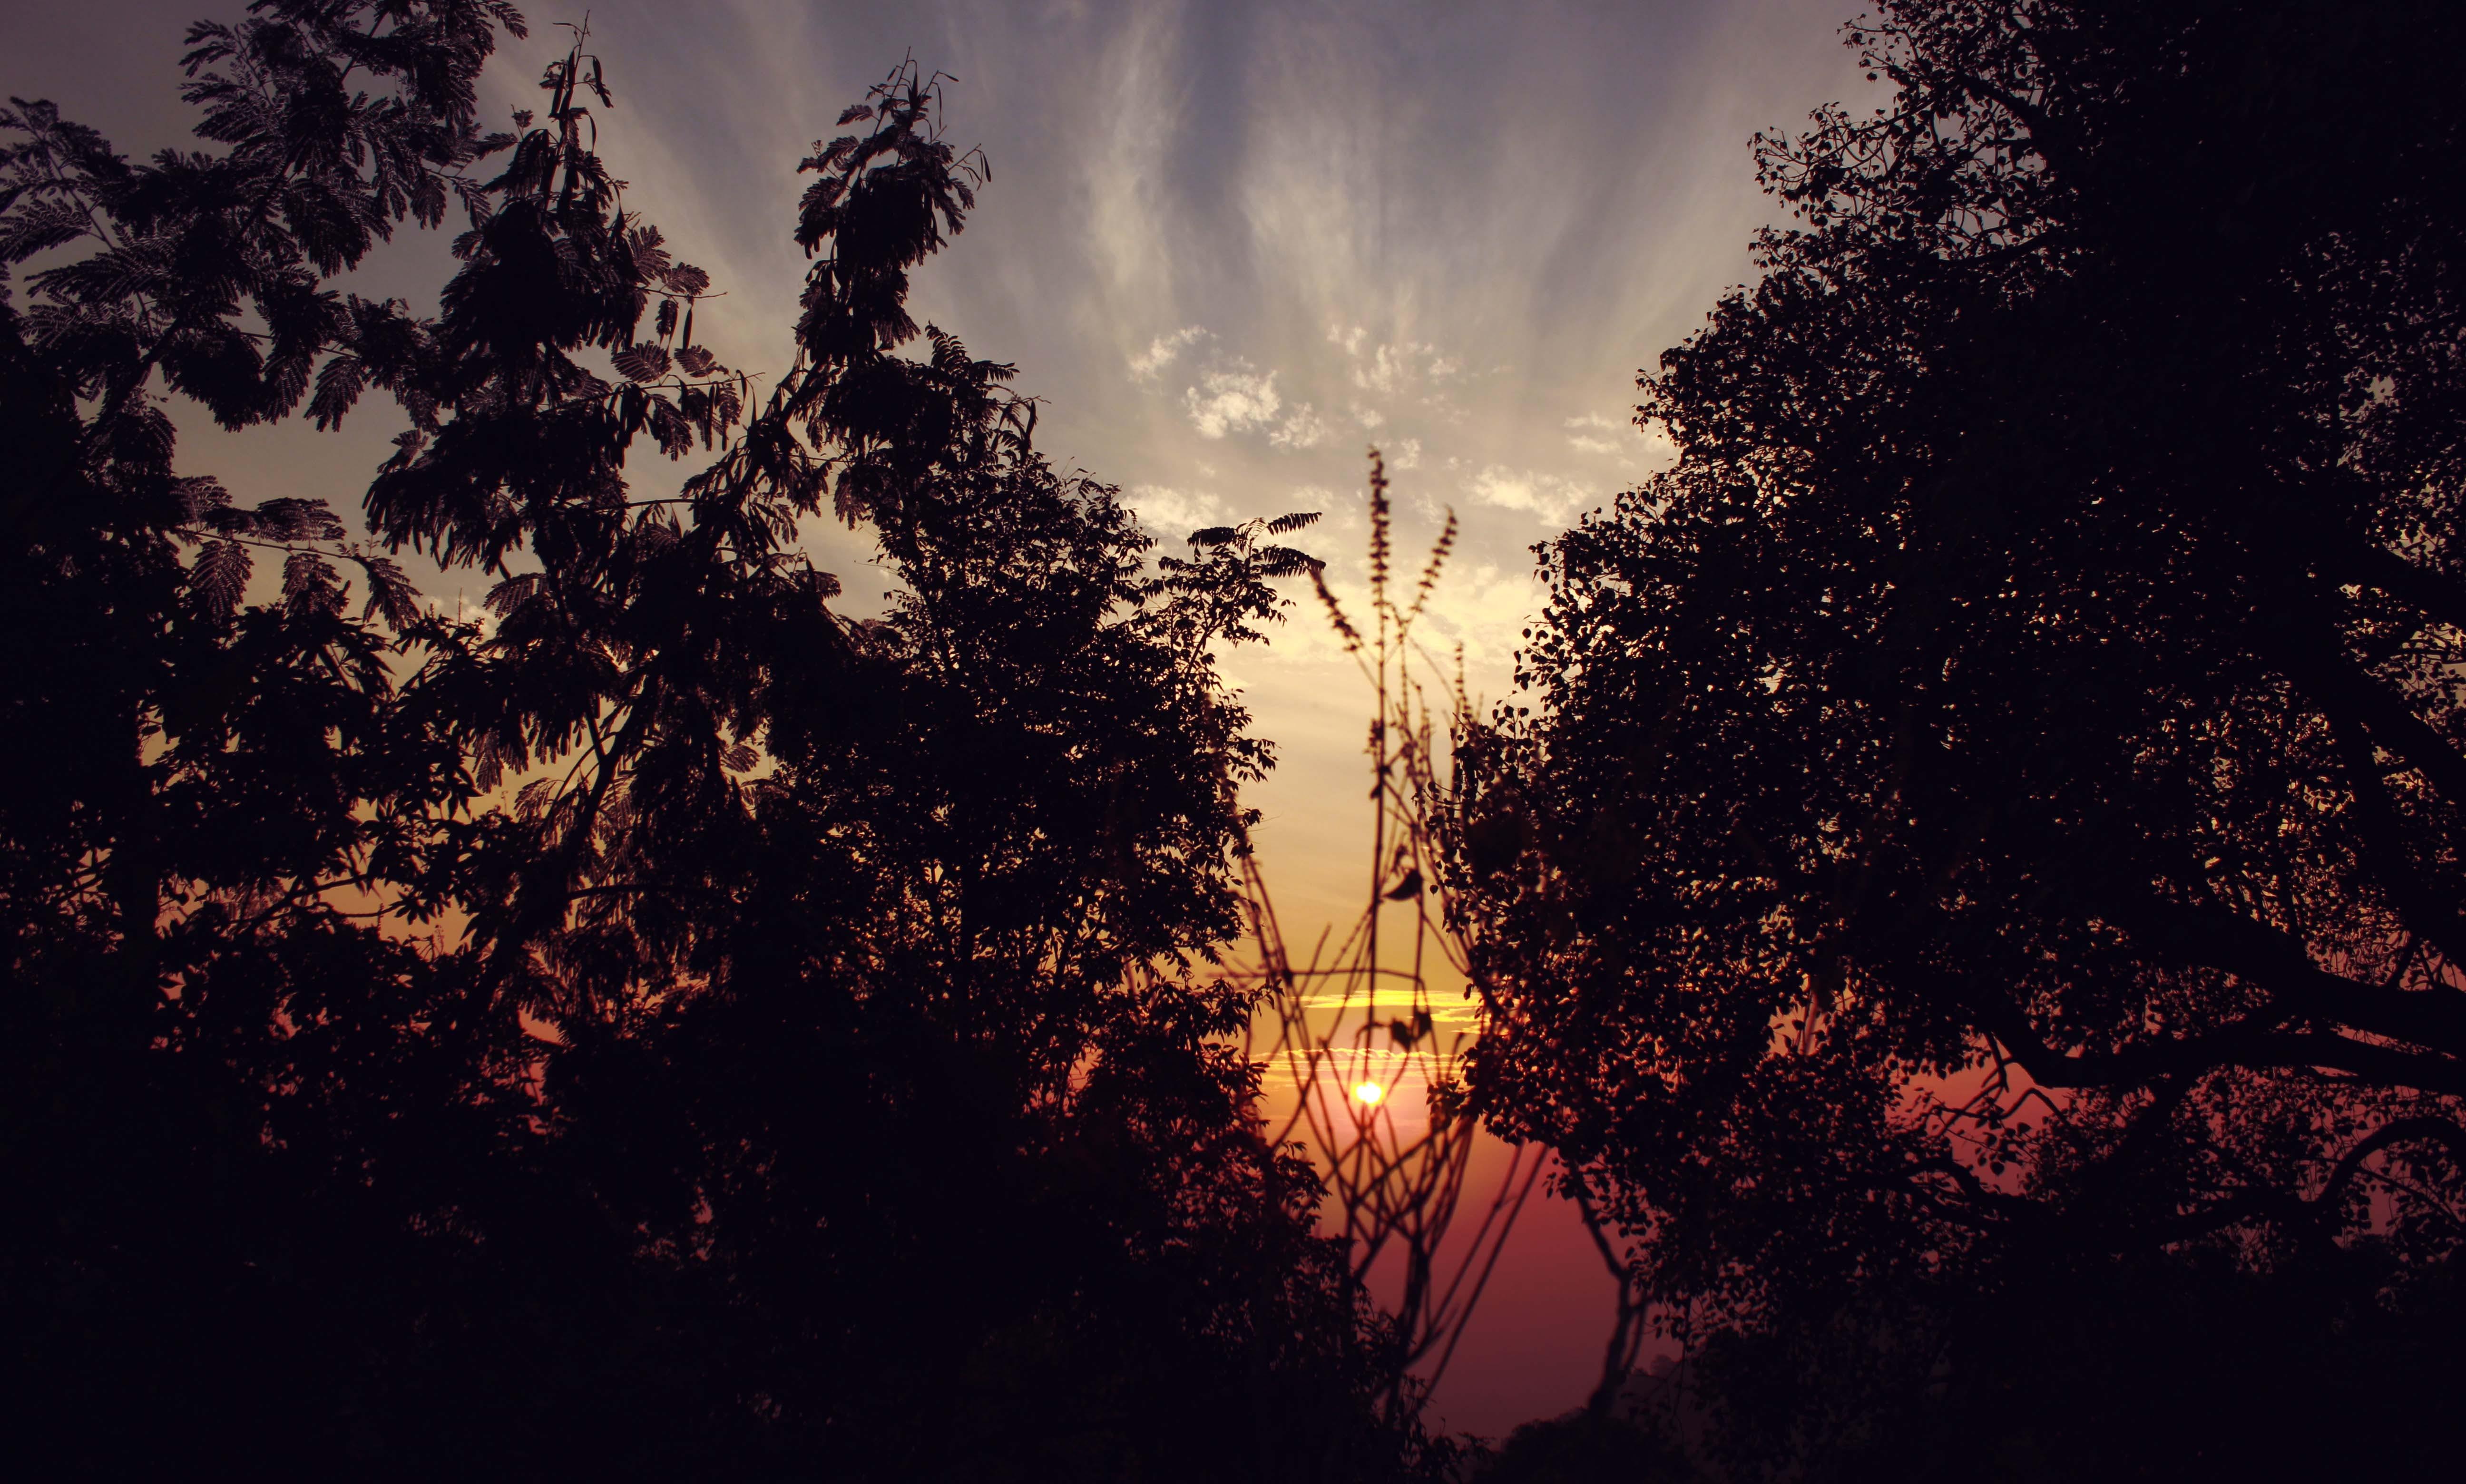 Black Trees during Sunrise